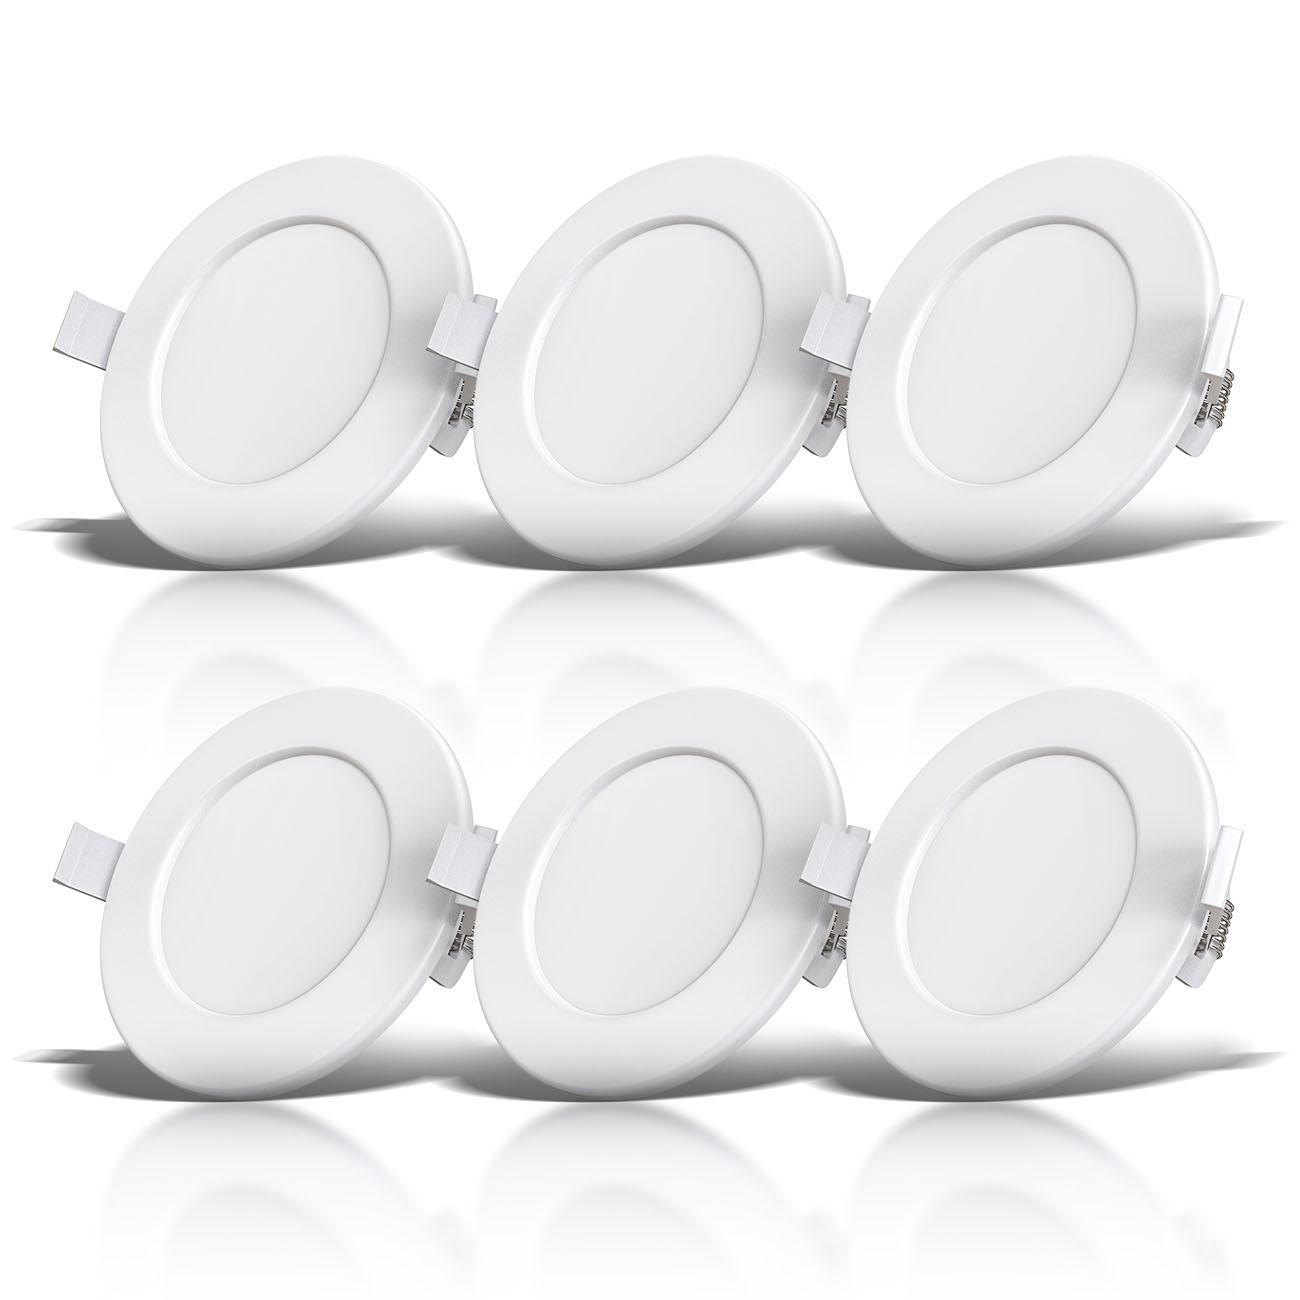 LED Einbaustrahler | Bad Einbauleuchte 6er SET | ultra flach 6W IP44 dimmbar - 3